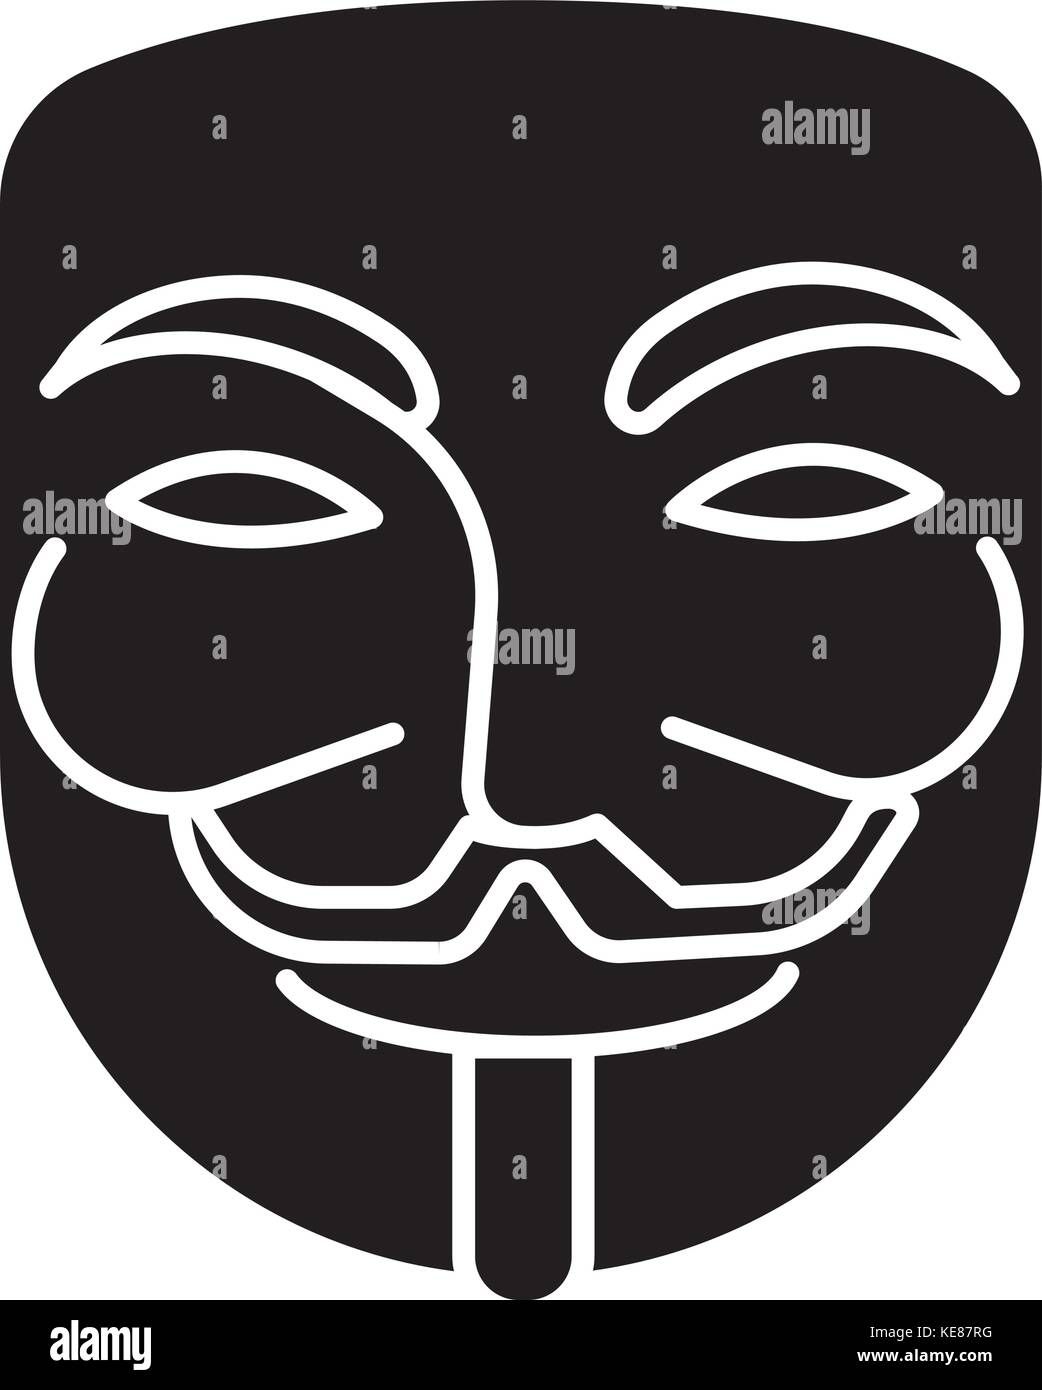 Anonymous Mask Carnival Hacker Icon Vector Illustration Black Stock Vector Image Art Alamy